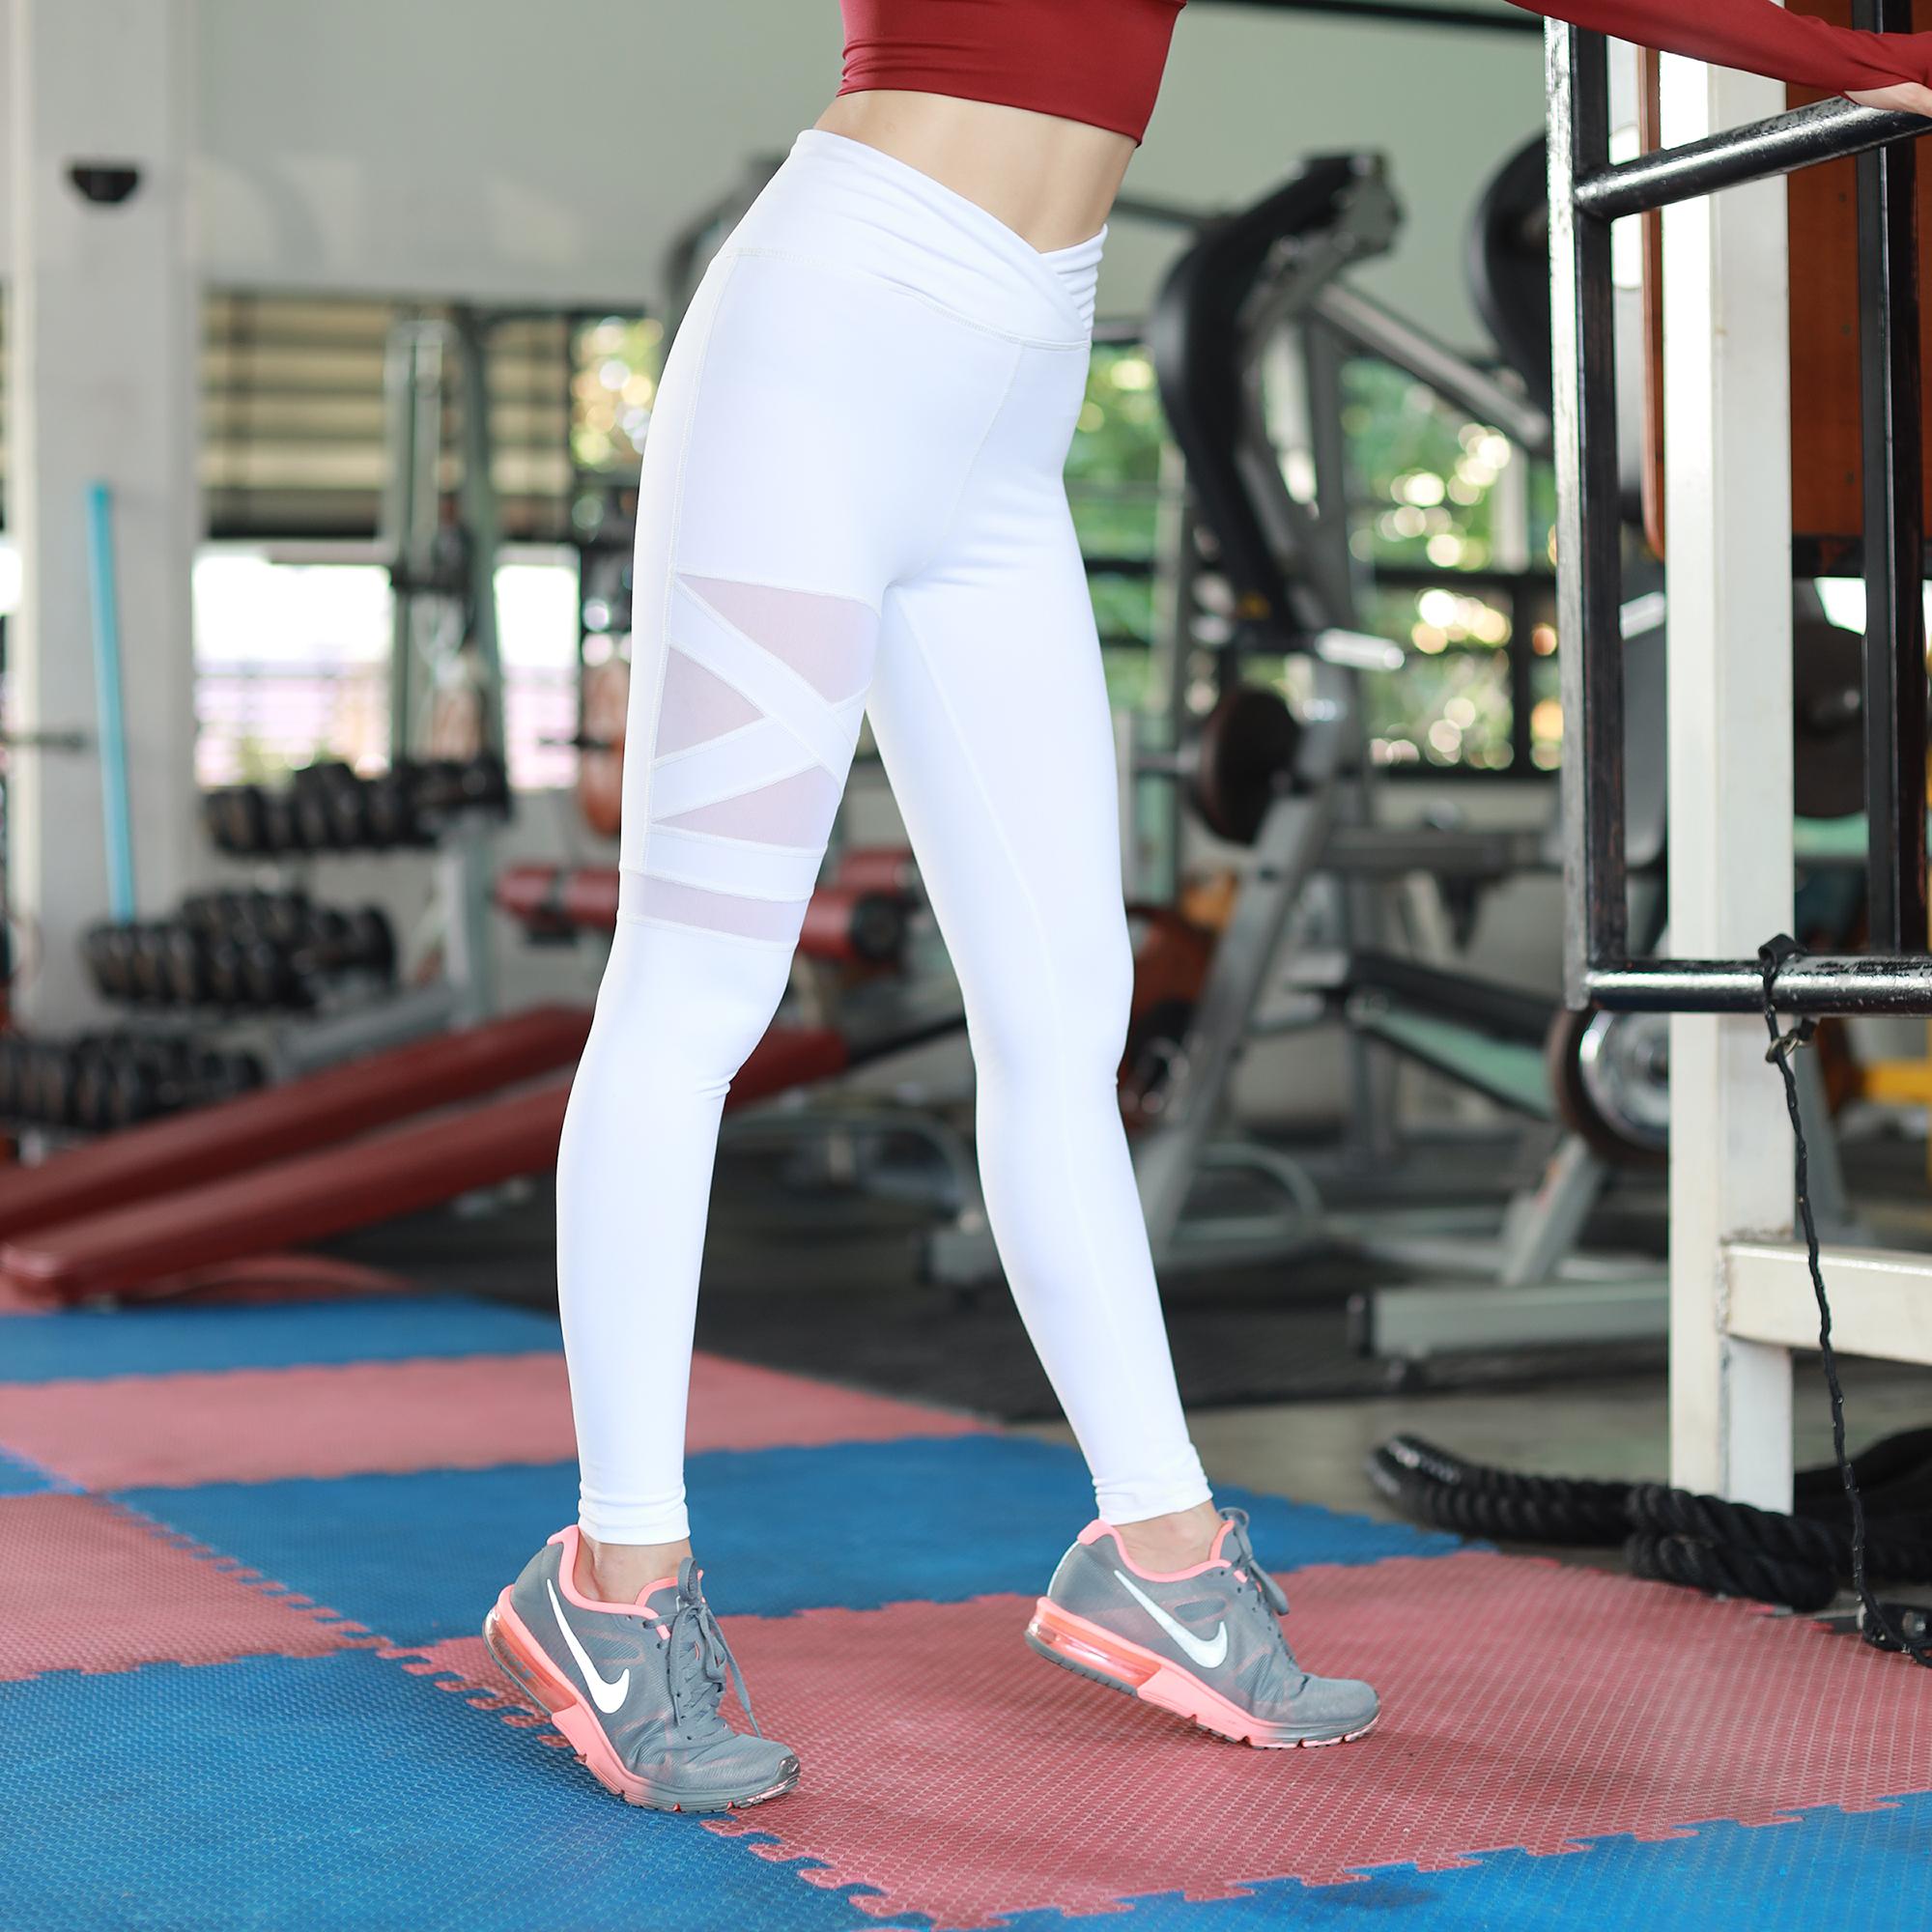 Rudy Sport Pants